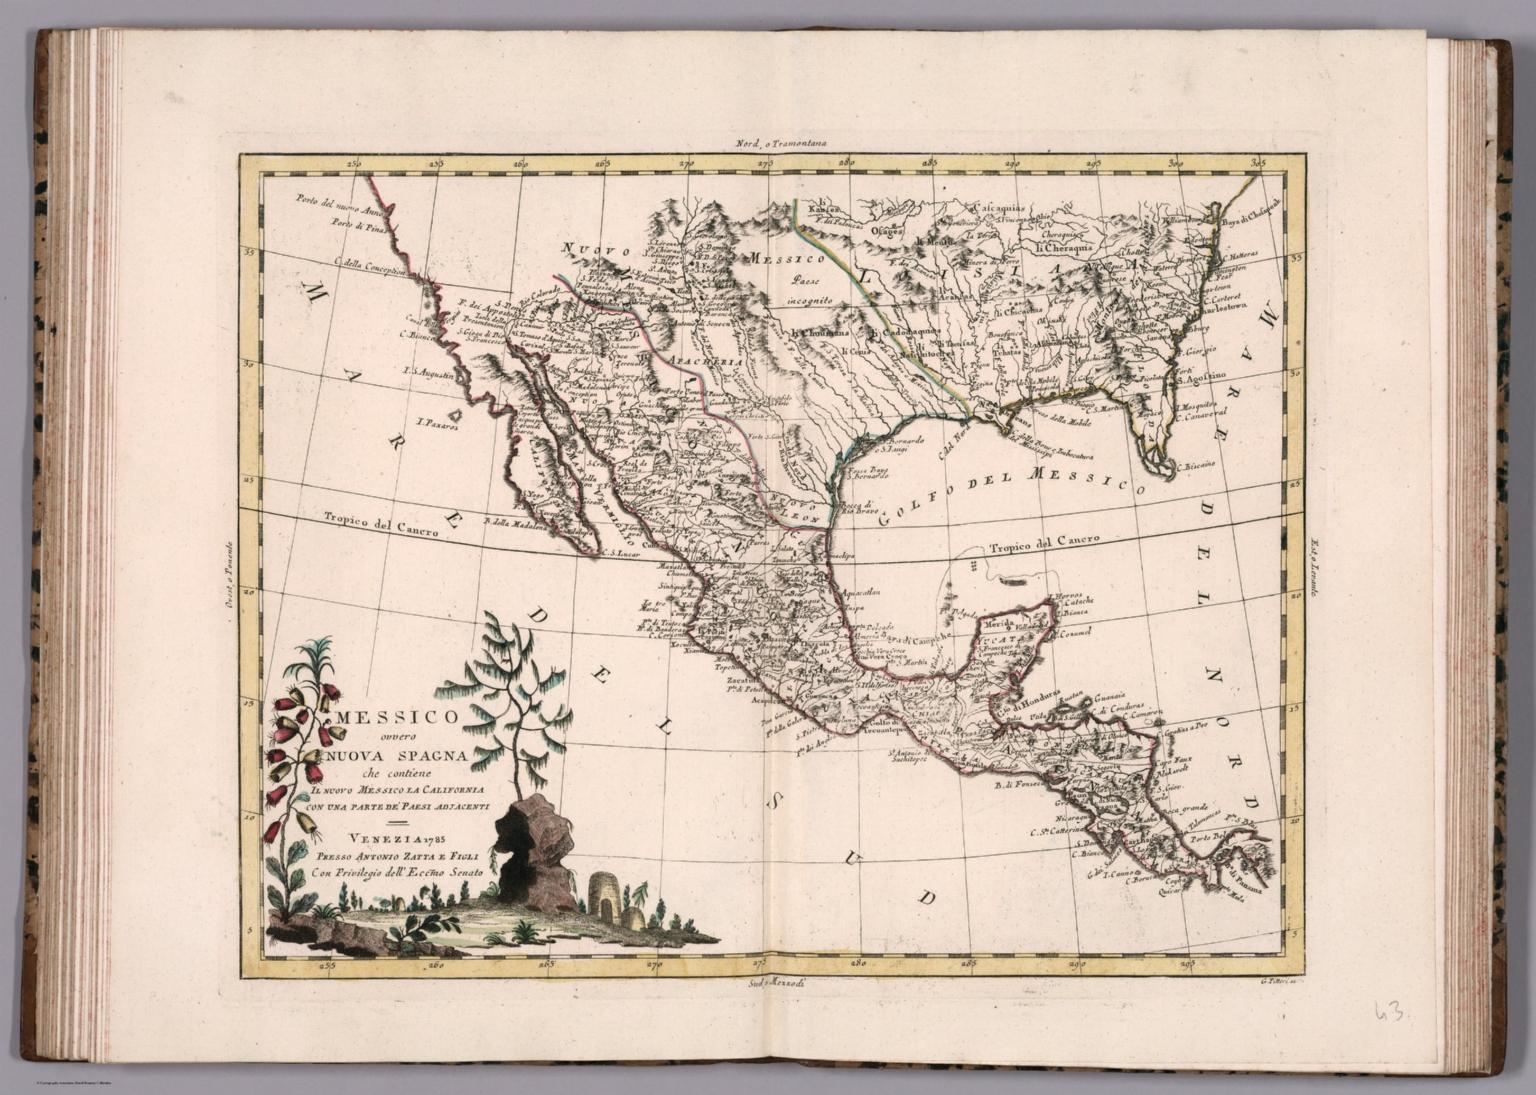 Messico ovvero Nuova Spagna